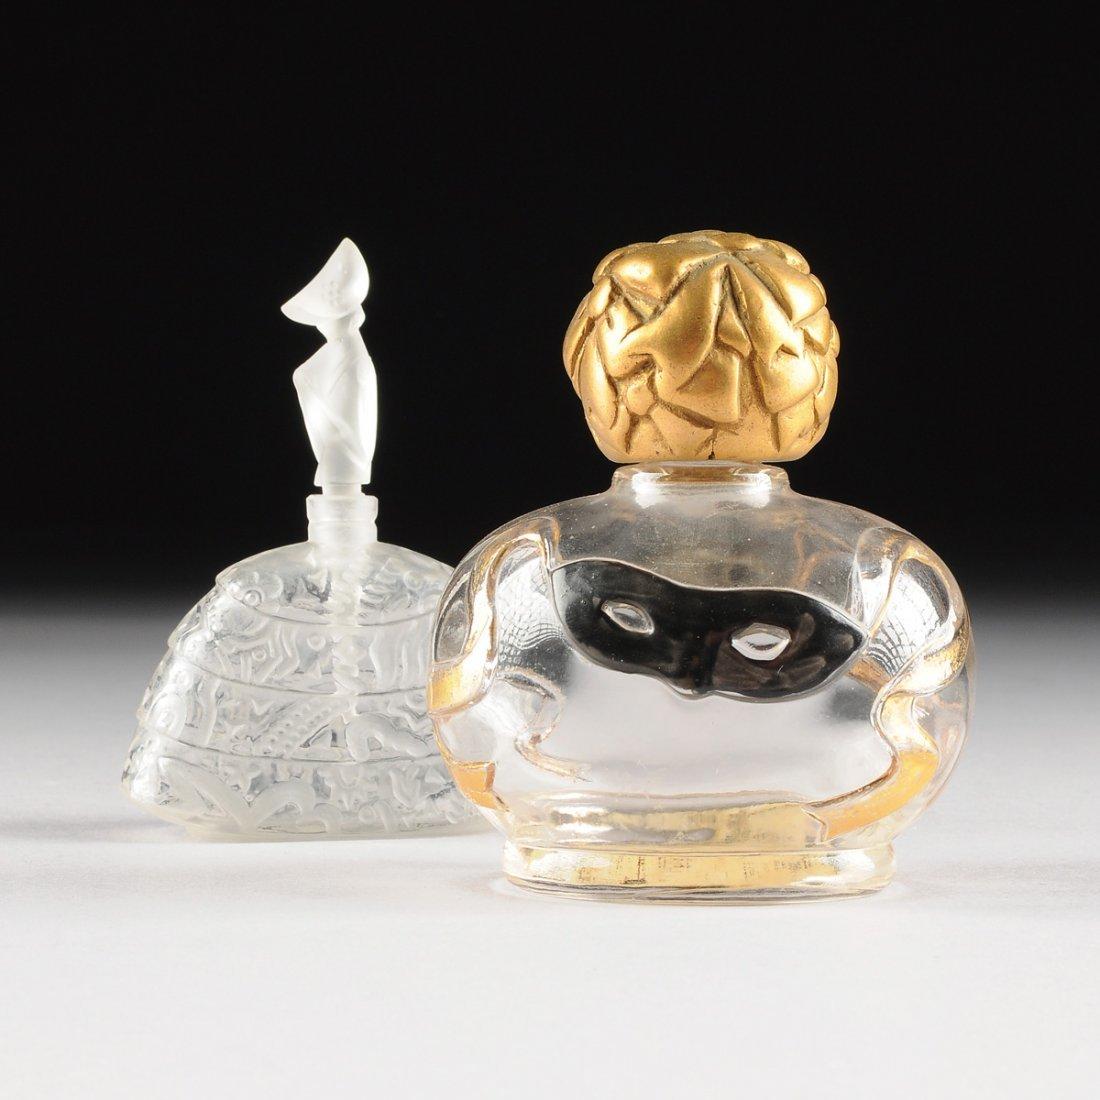 TWO VINTAGE GLASS DESIGNER PERFUME BOTTLES, CIRCA FIRST